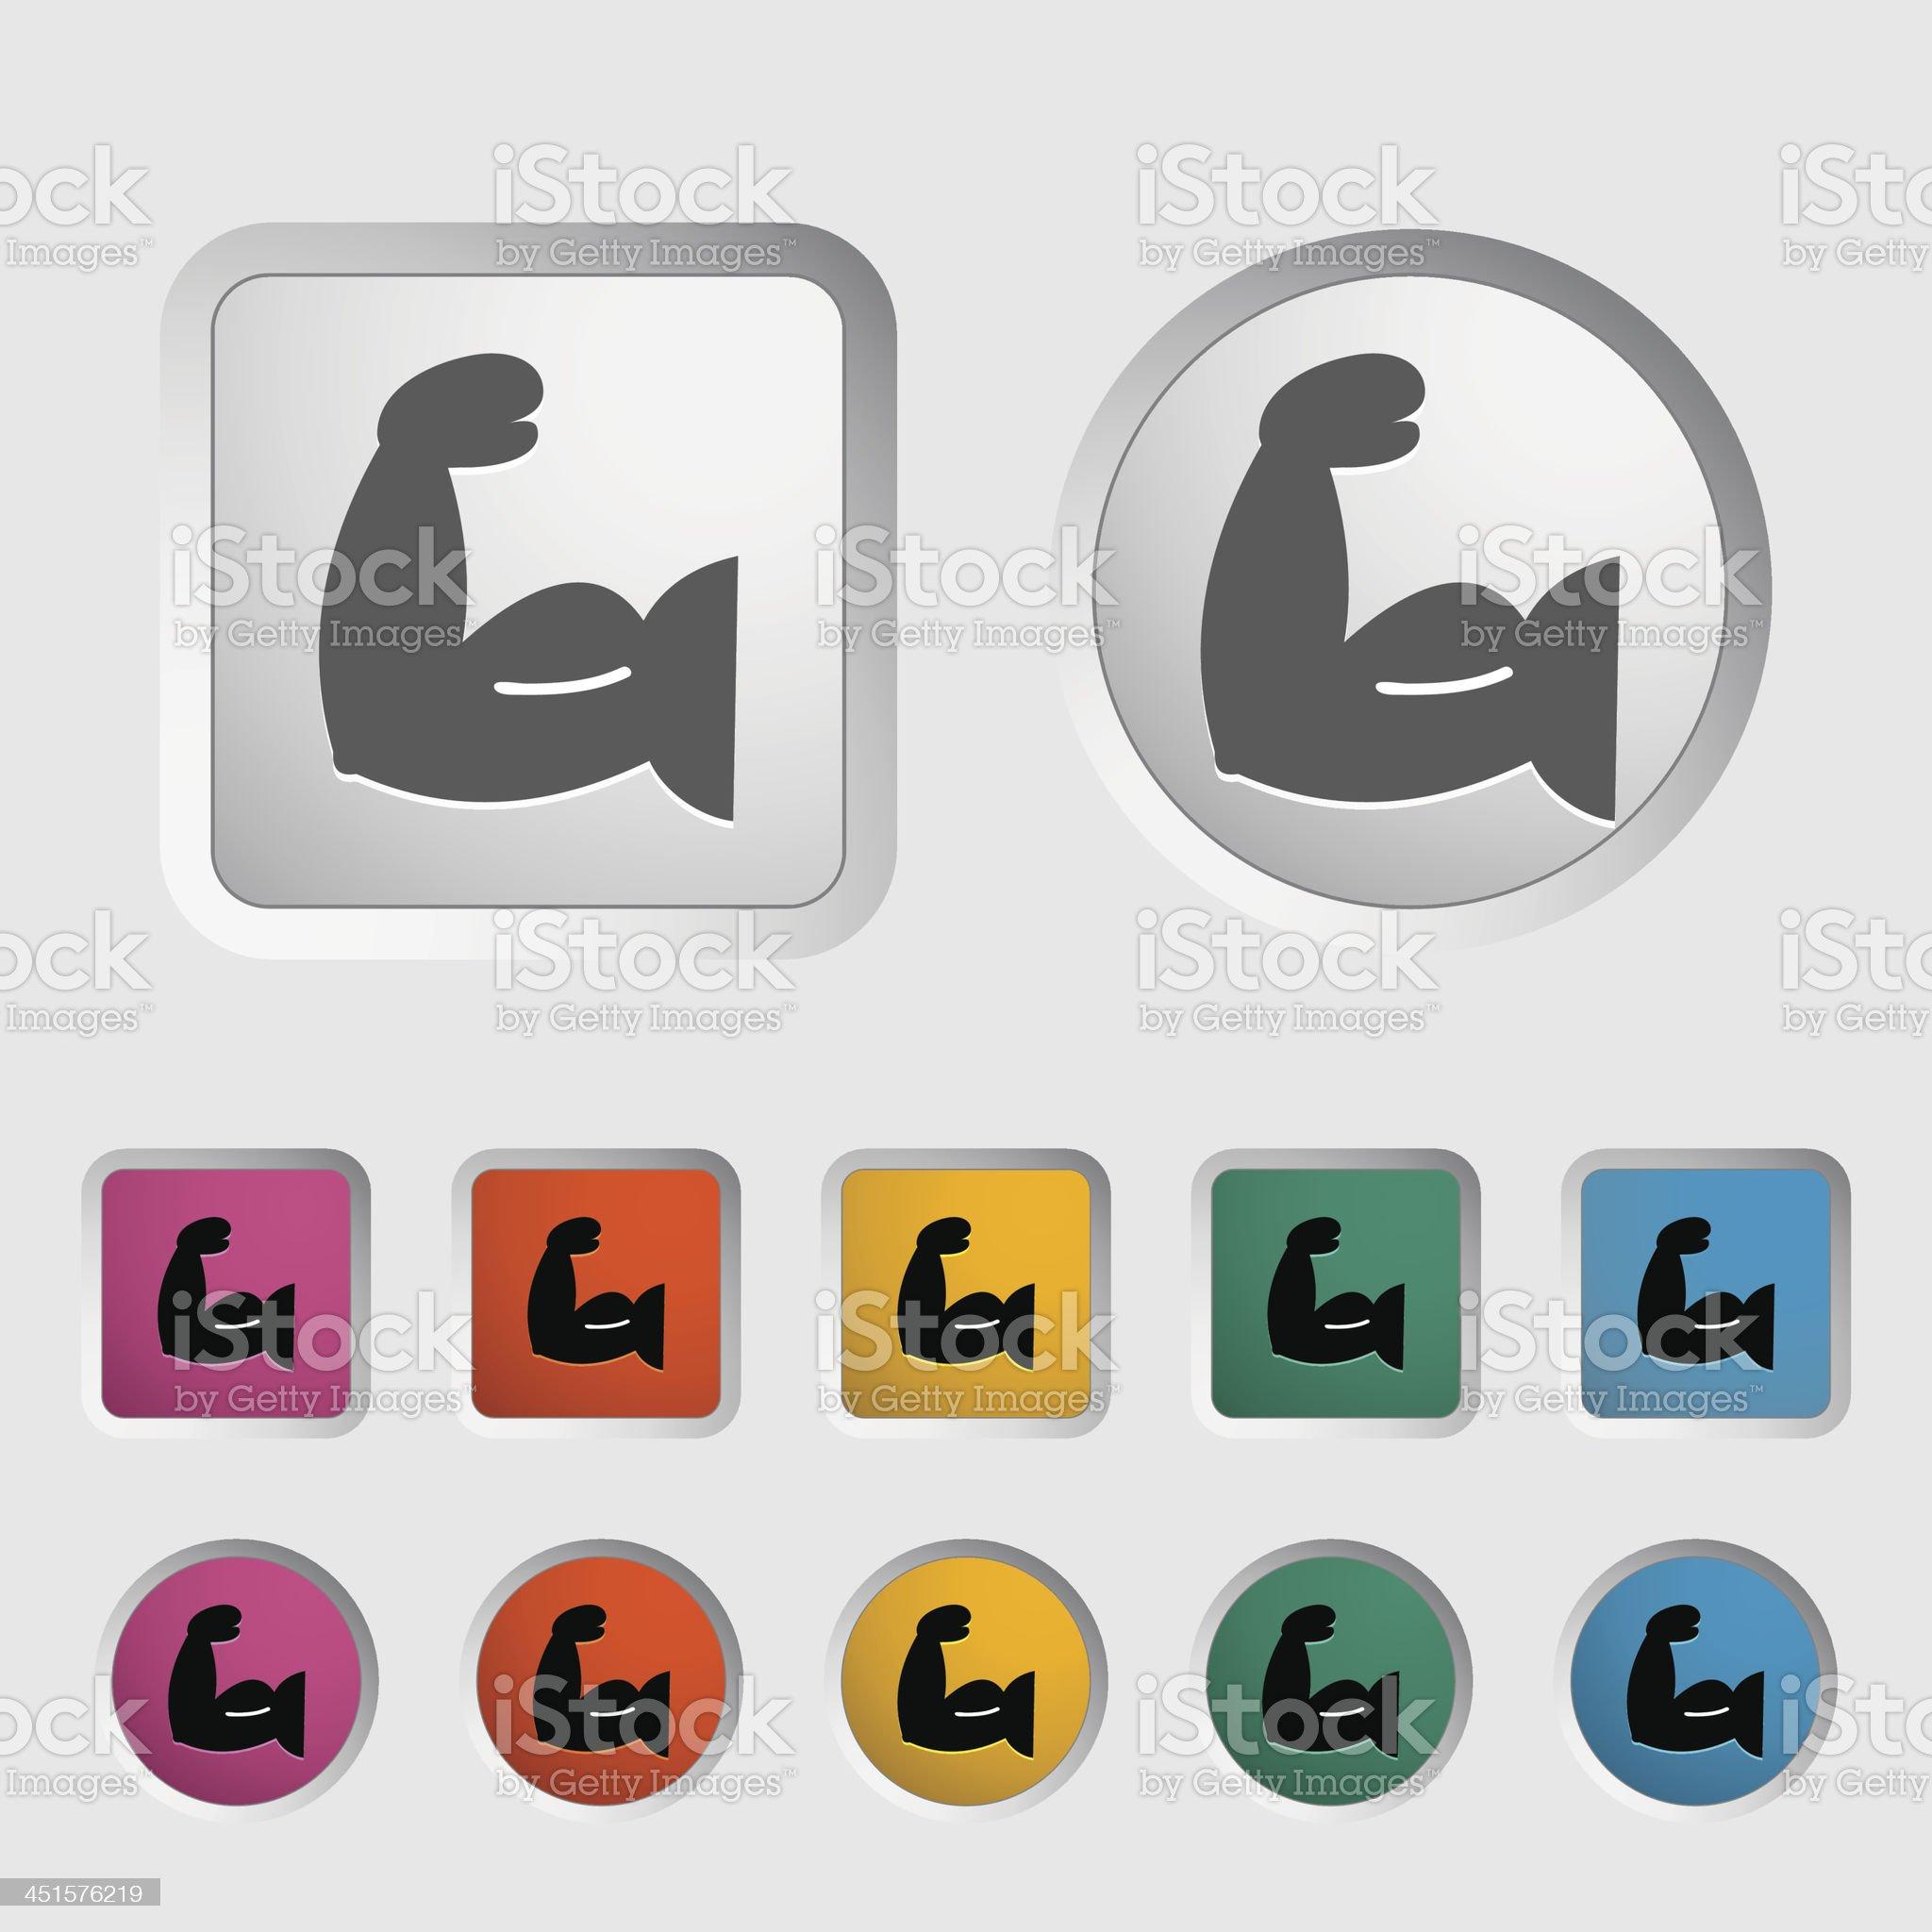 Icon of bodybuilding. royalty-free stock vector art